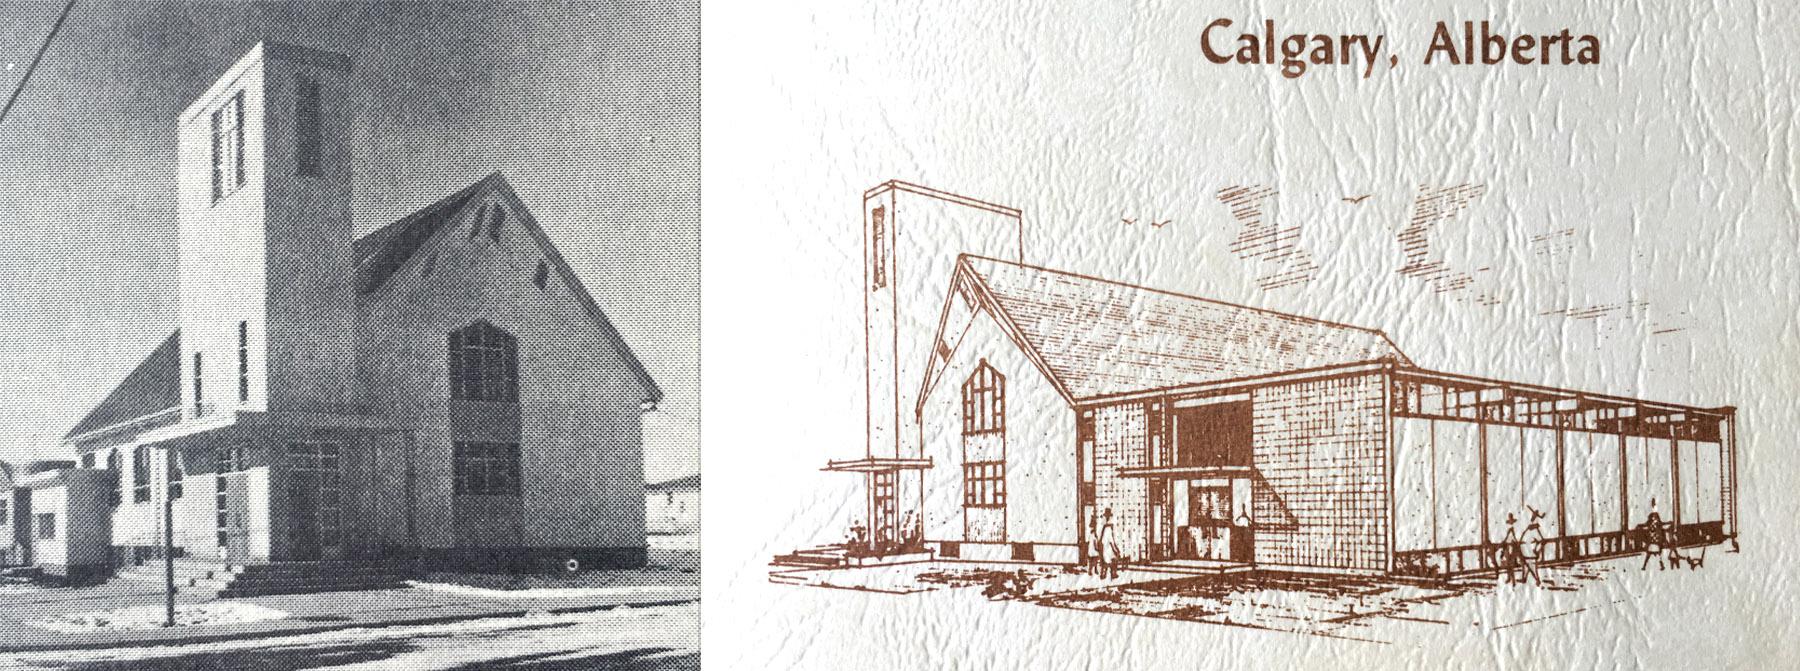 Original Kensington building 1955 alongside architectural drawing for proposed expansion 1962